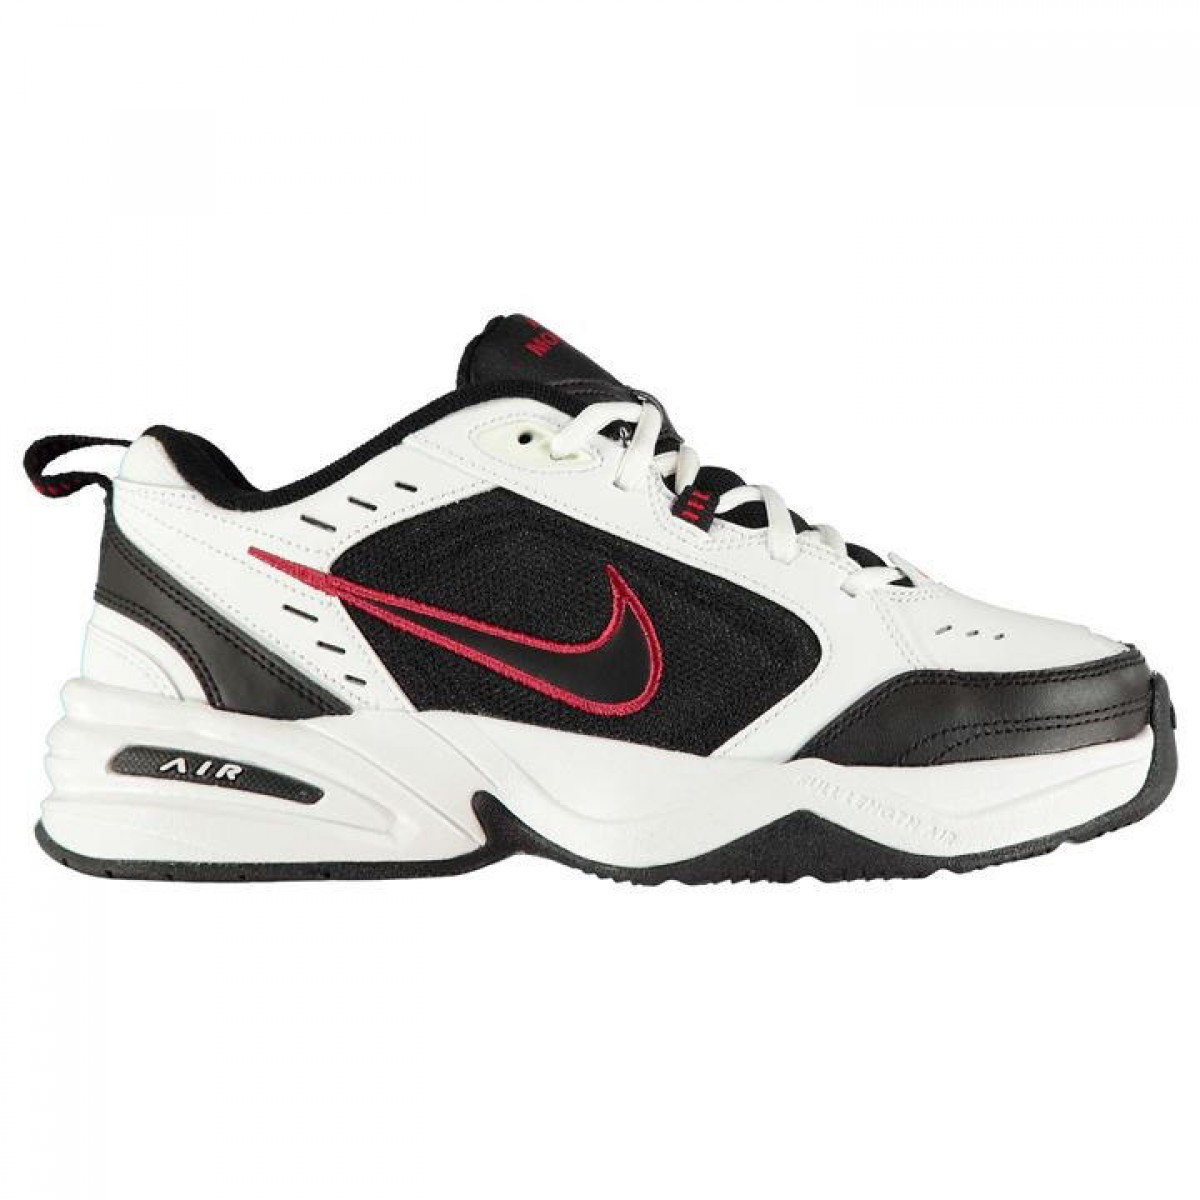 Кроссовки Nike Air Monarch White Black Red - Оригинал - FAIR - оригинальная  одежда 84552681712